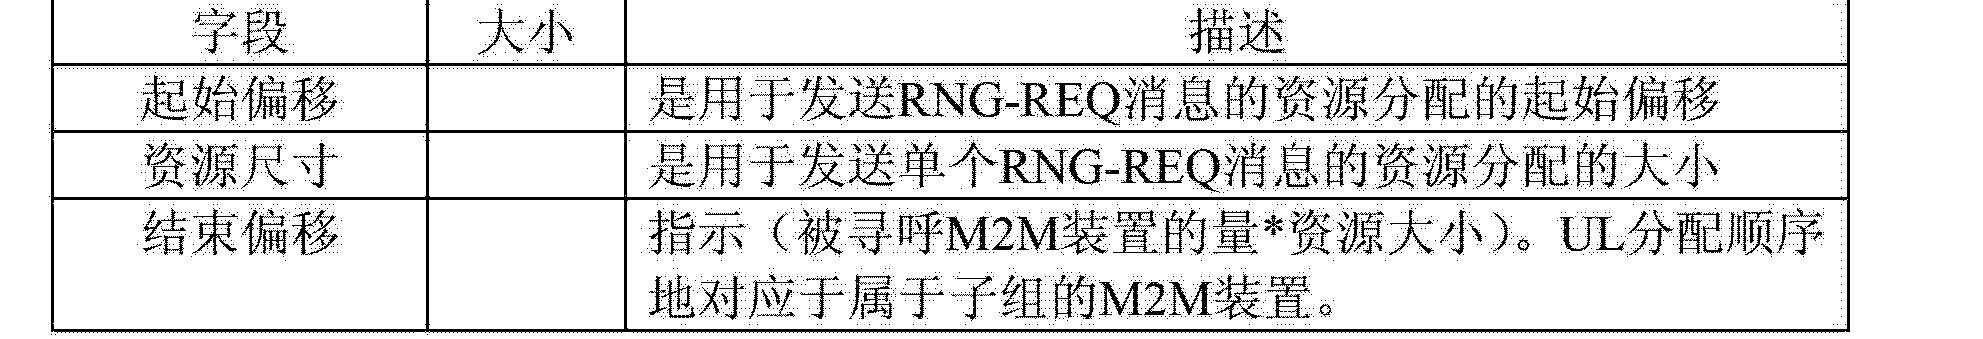 Figure CN103250362AD00113